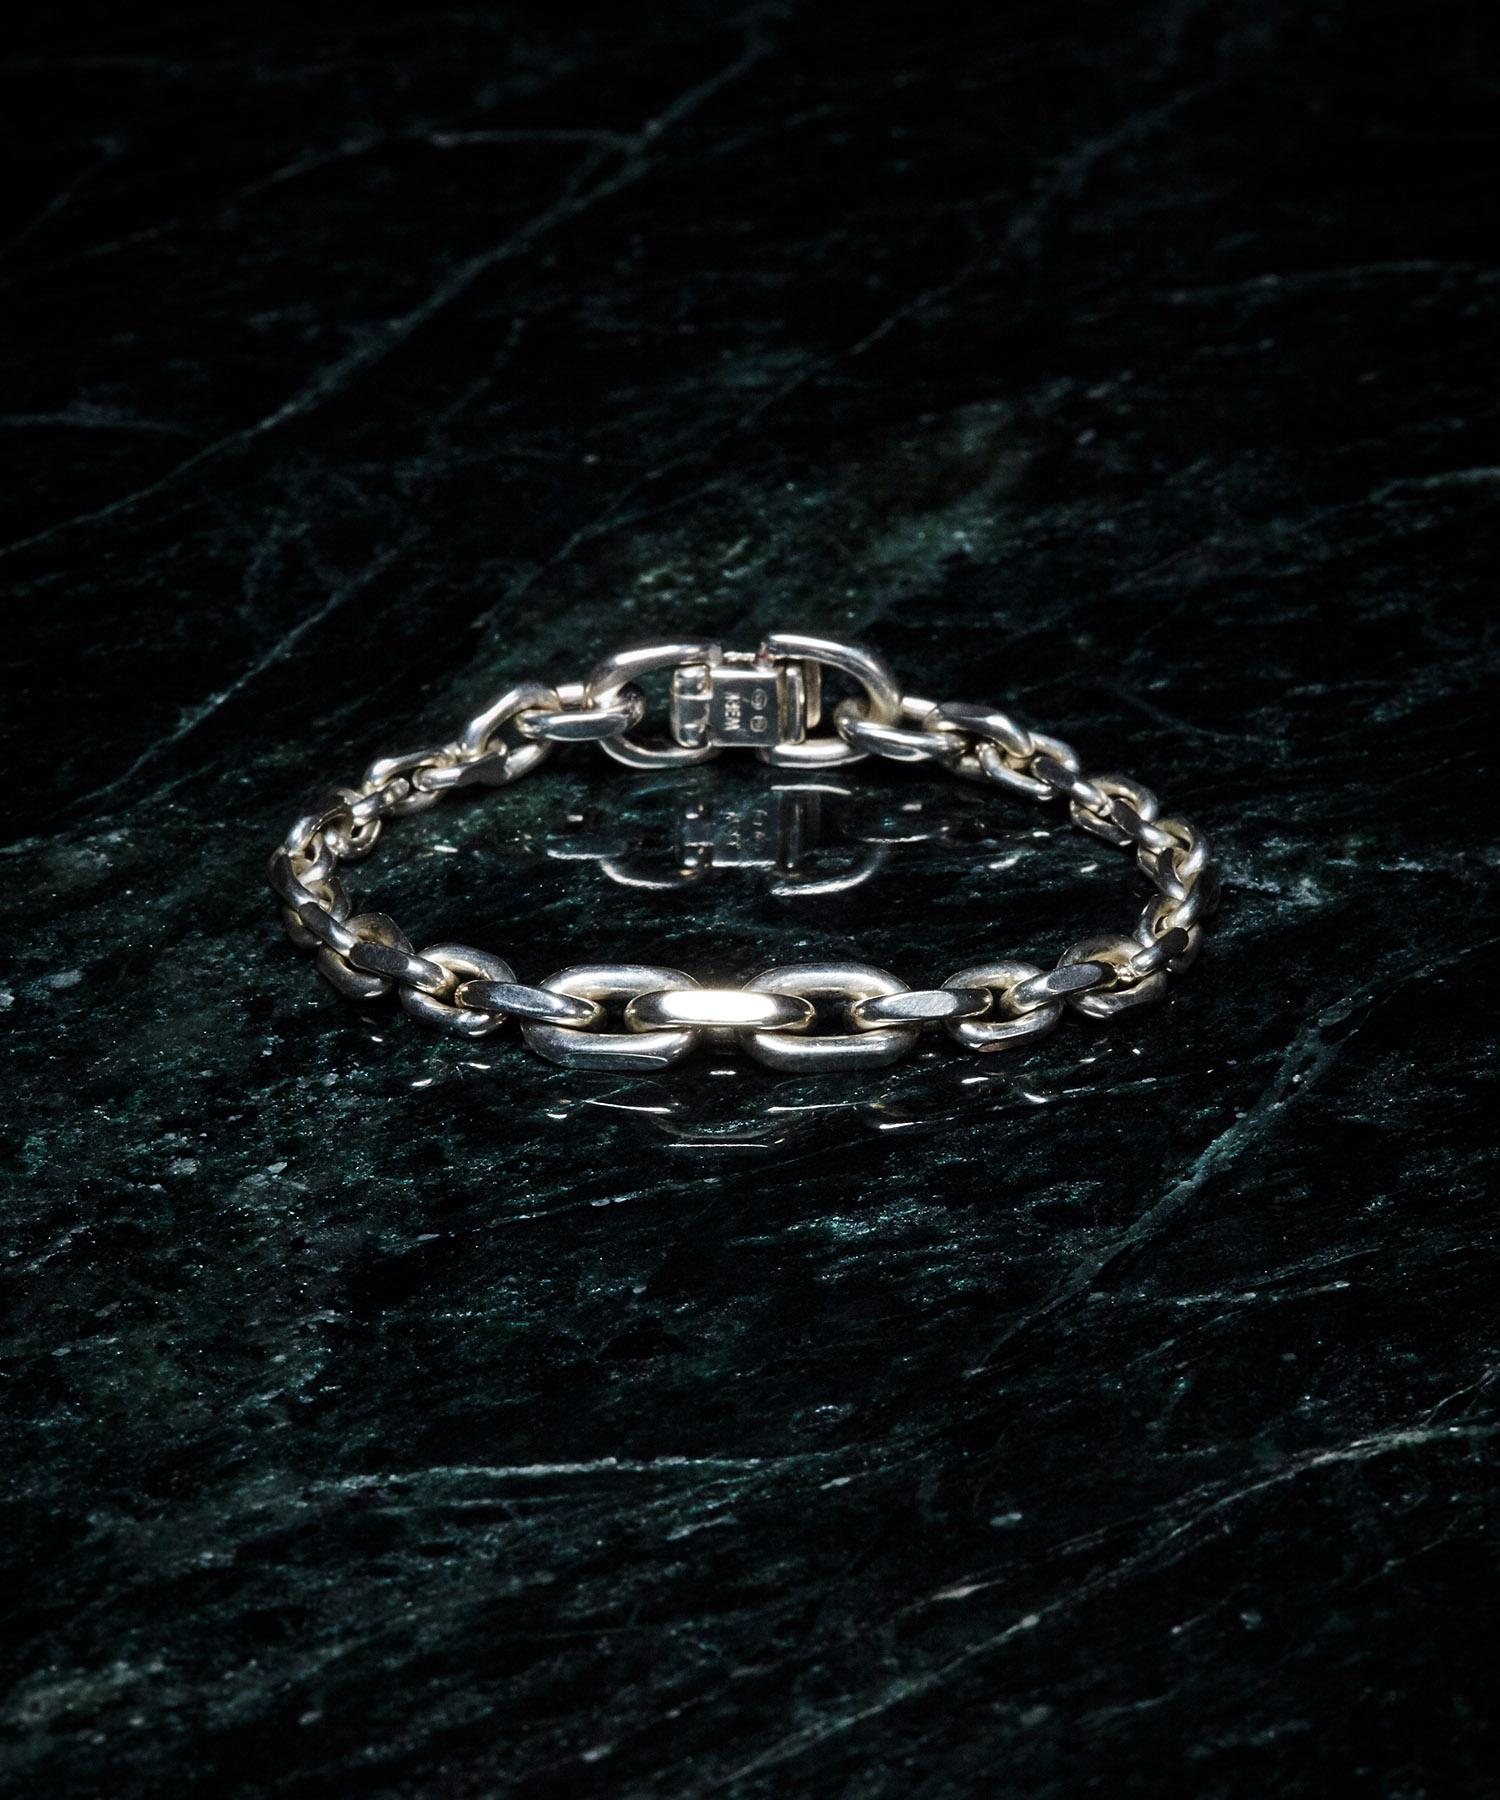 |WERK / Bracelet (BR-07)